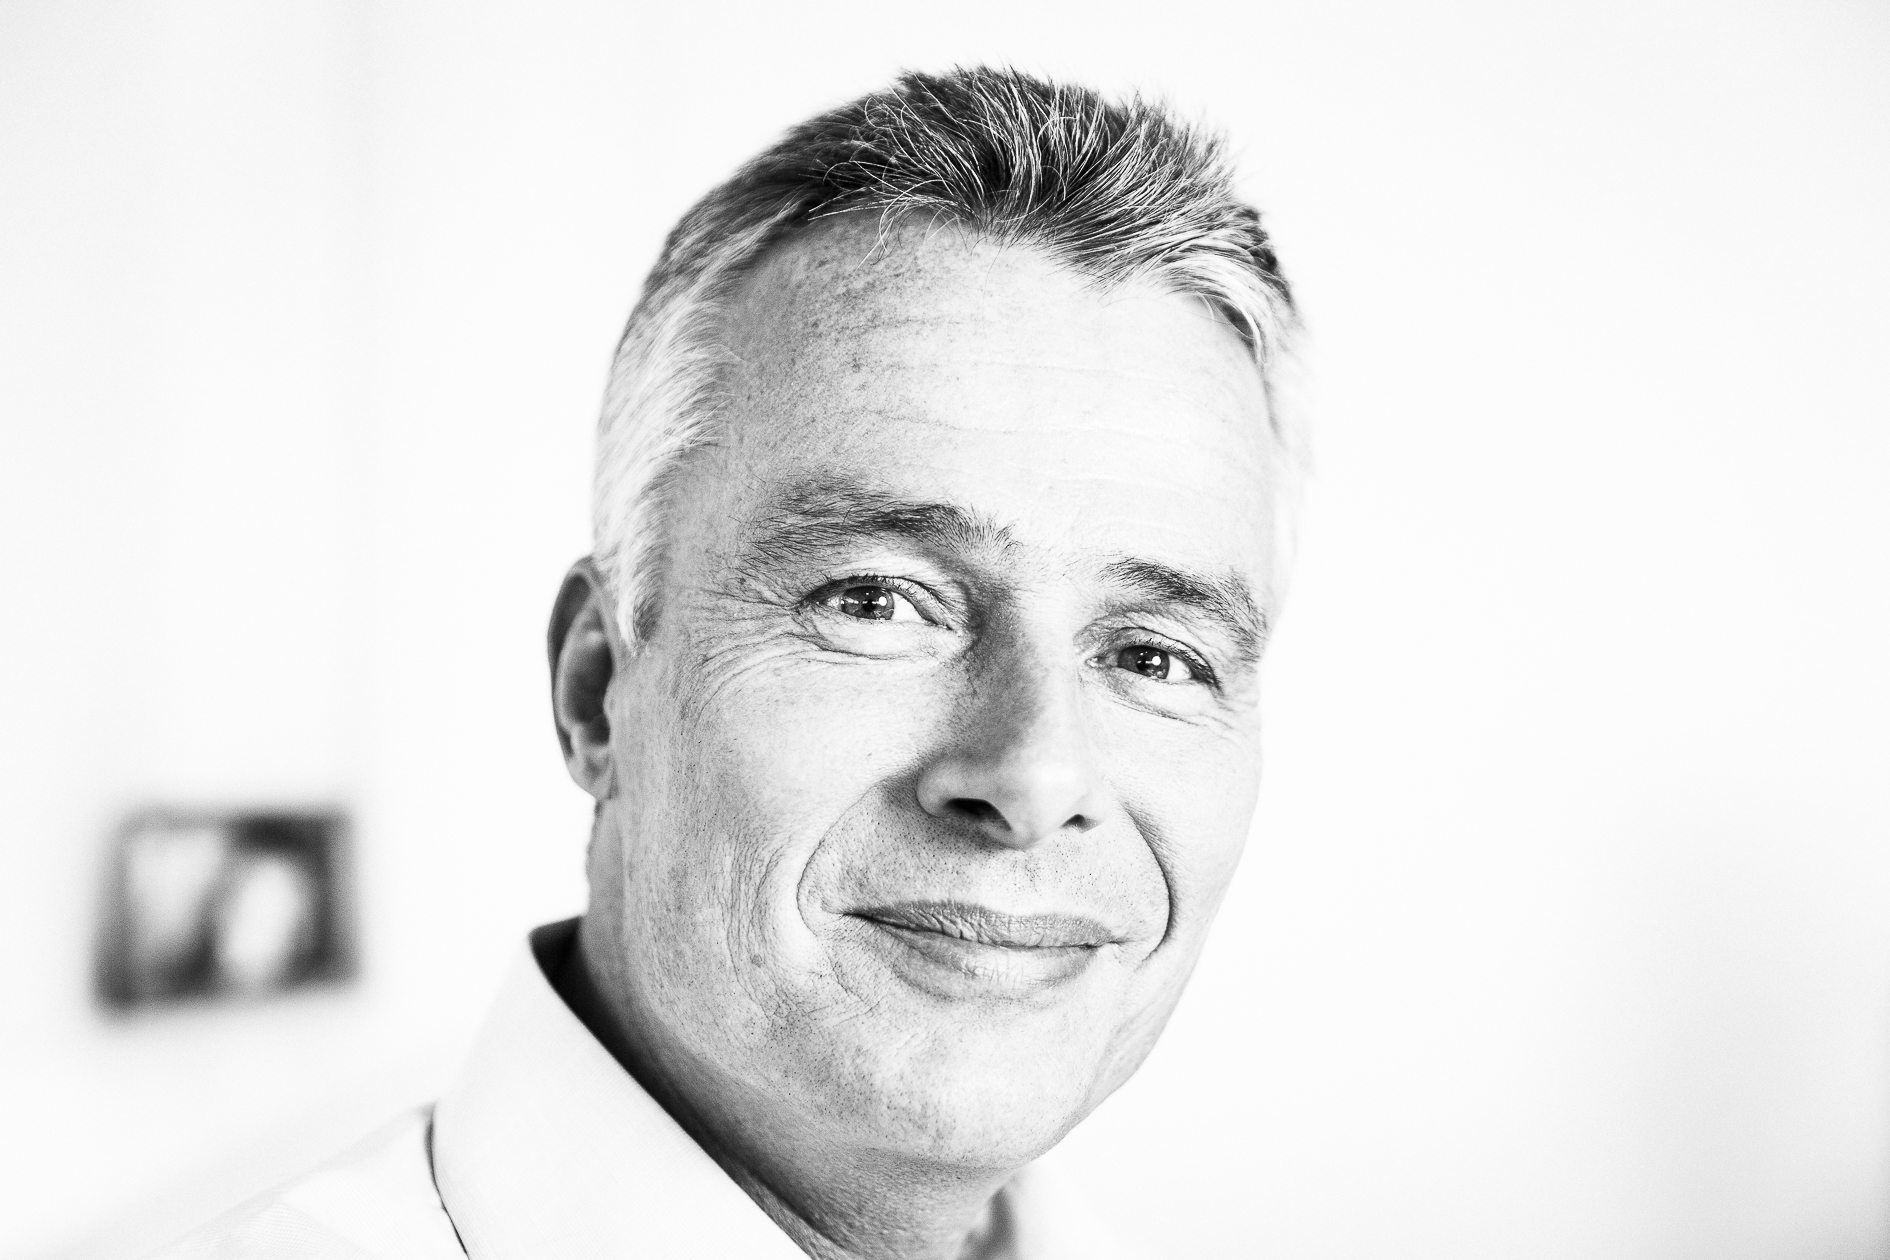 Christian Van Thillo